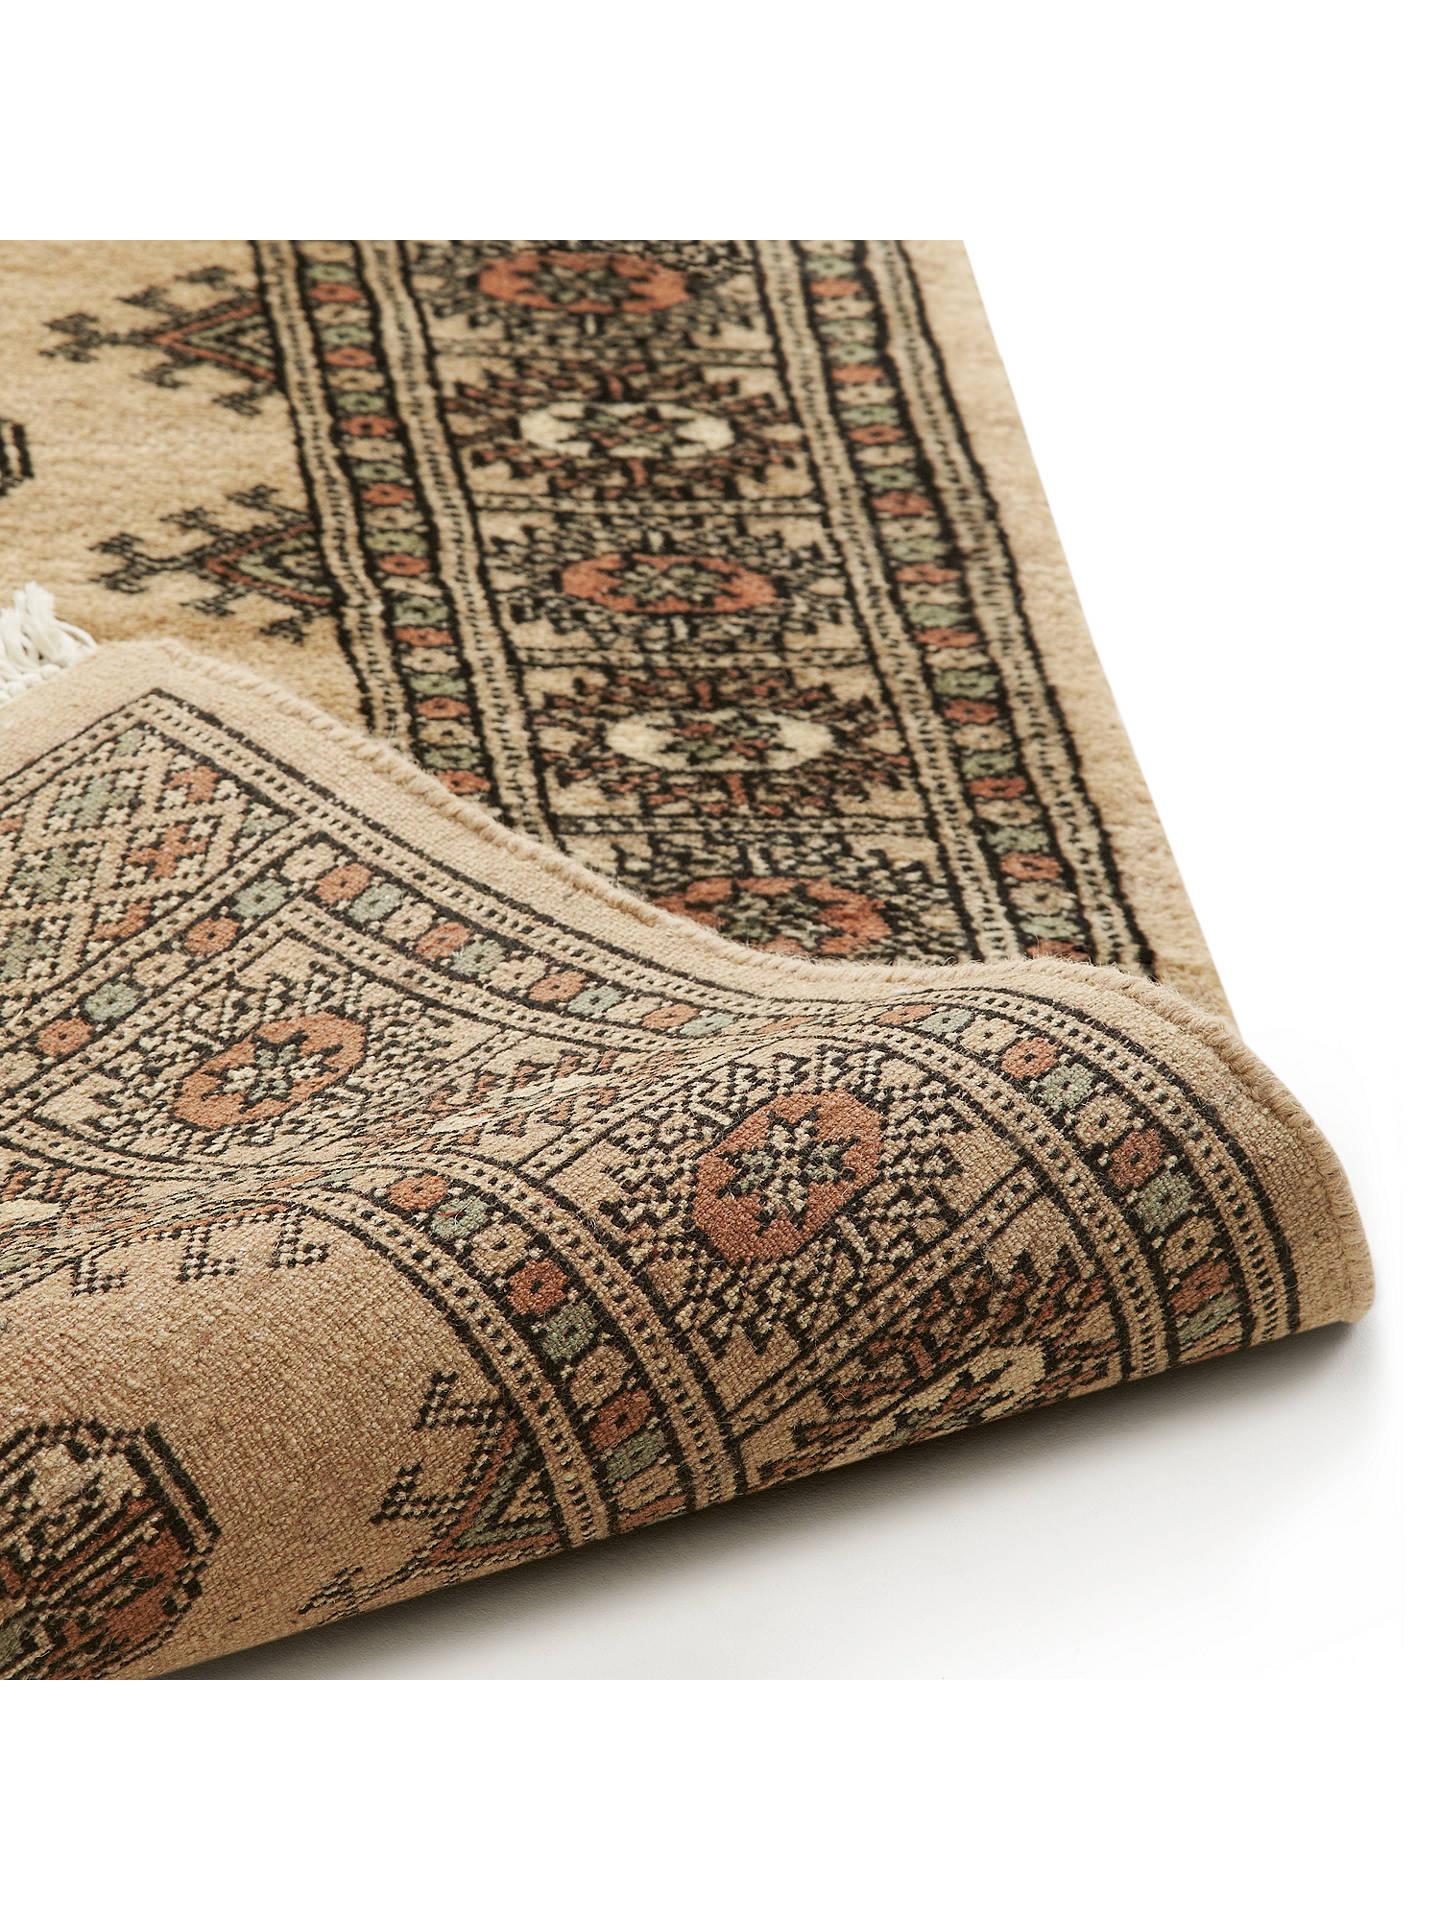 Gooch Luxury Stan Bokhara Handmade Rug At John Lewis